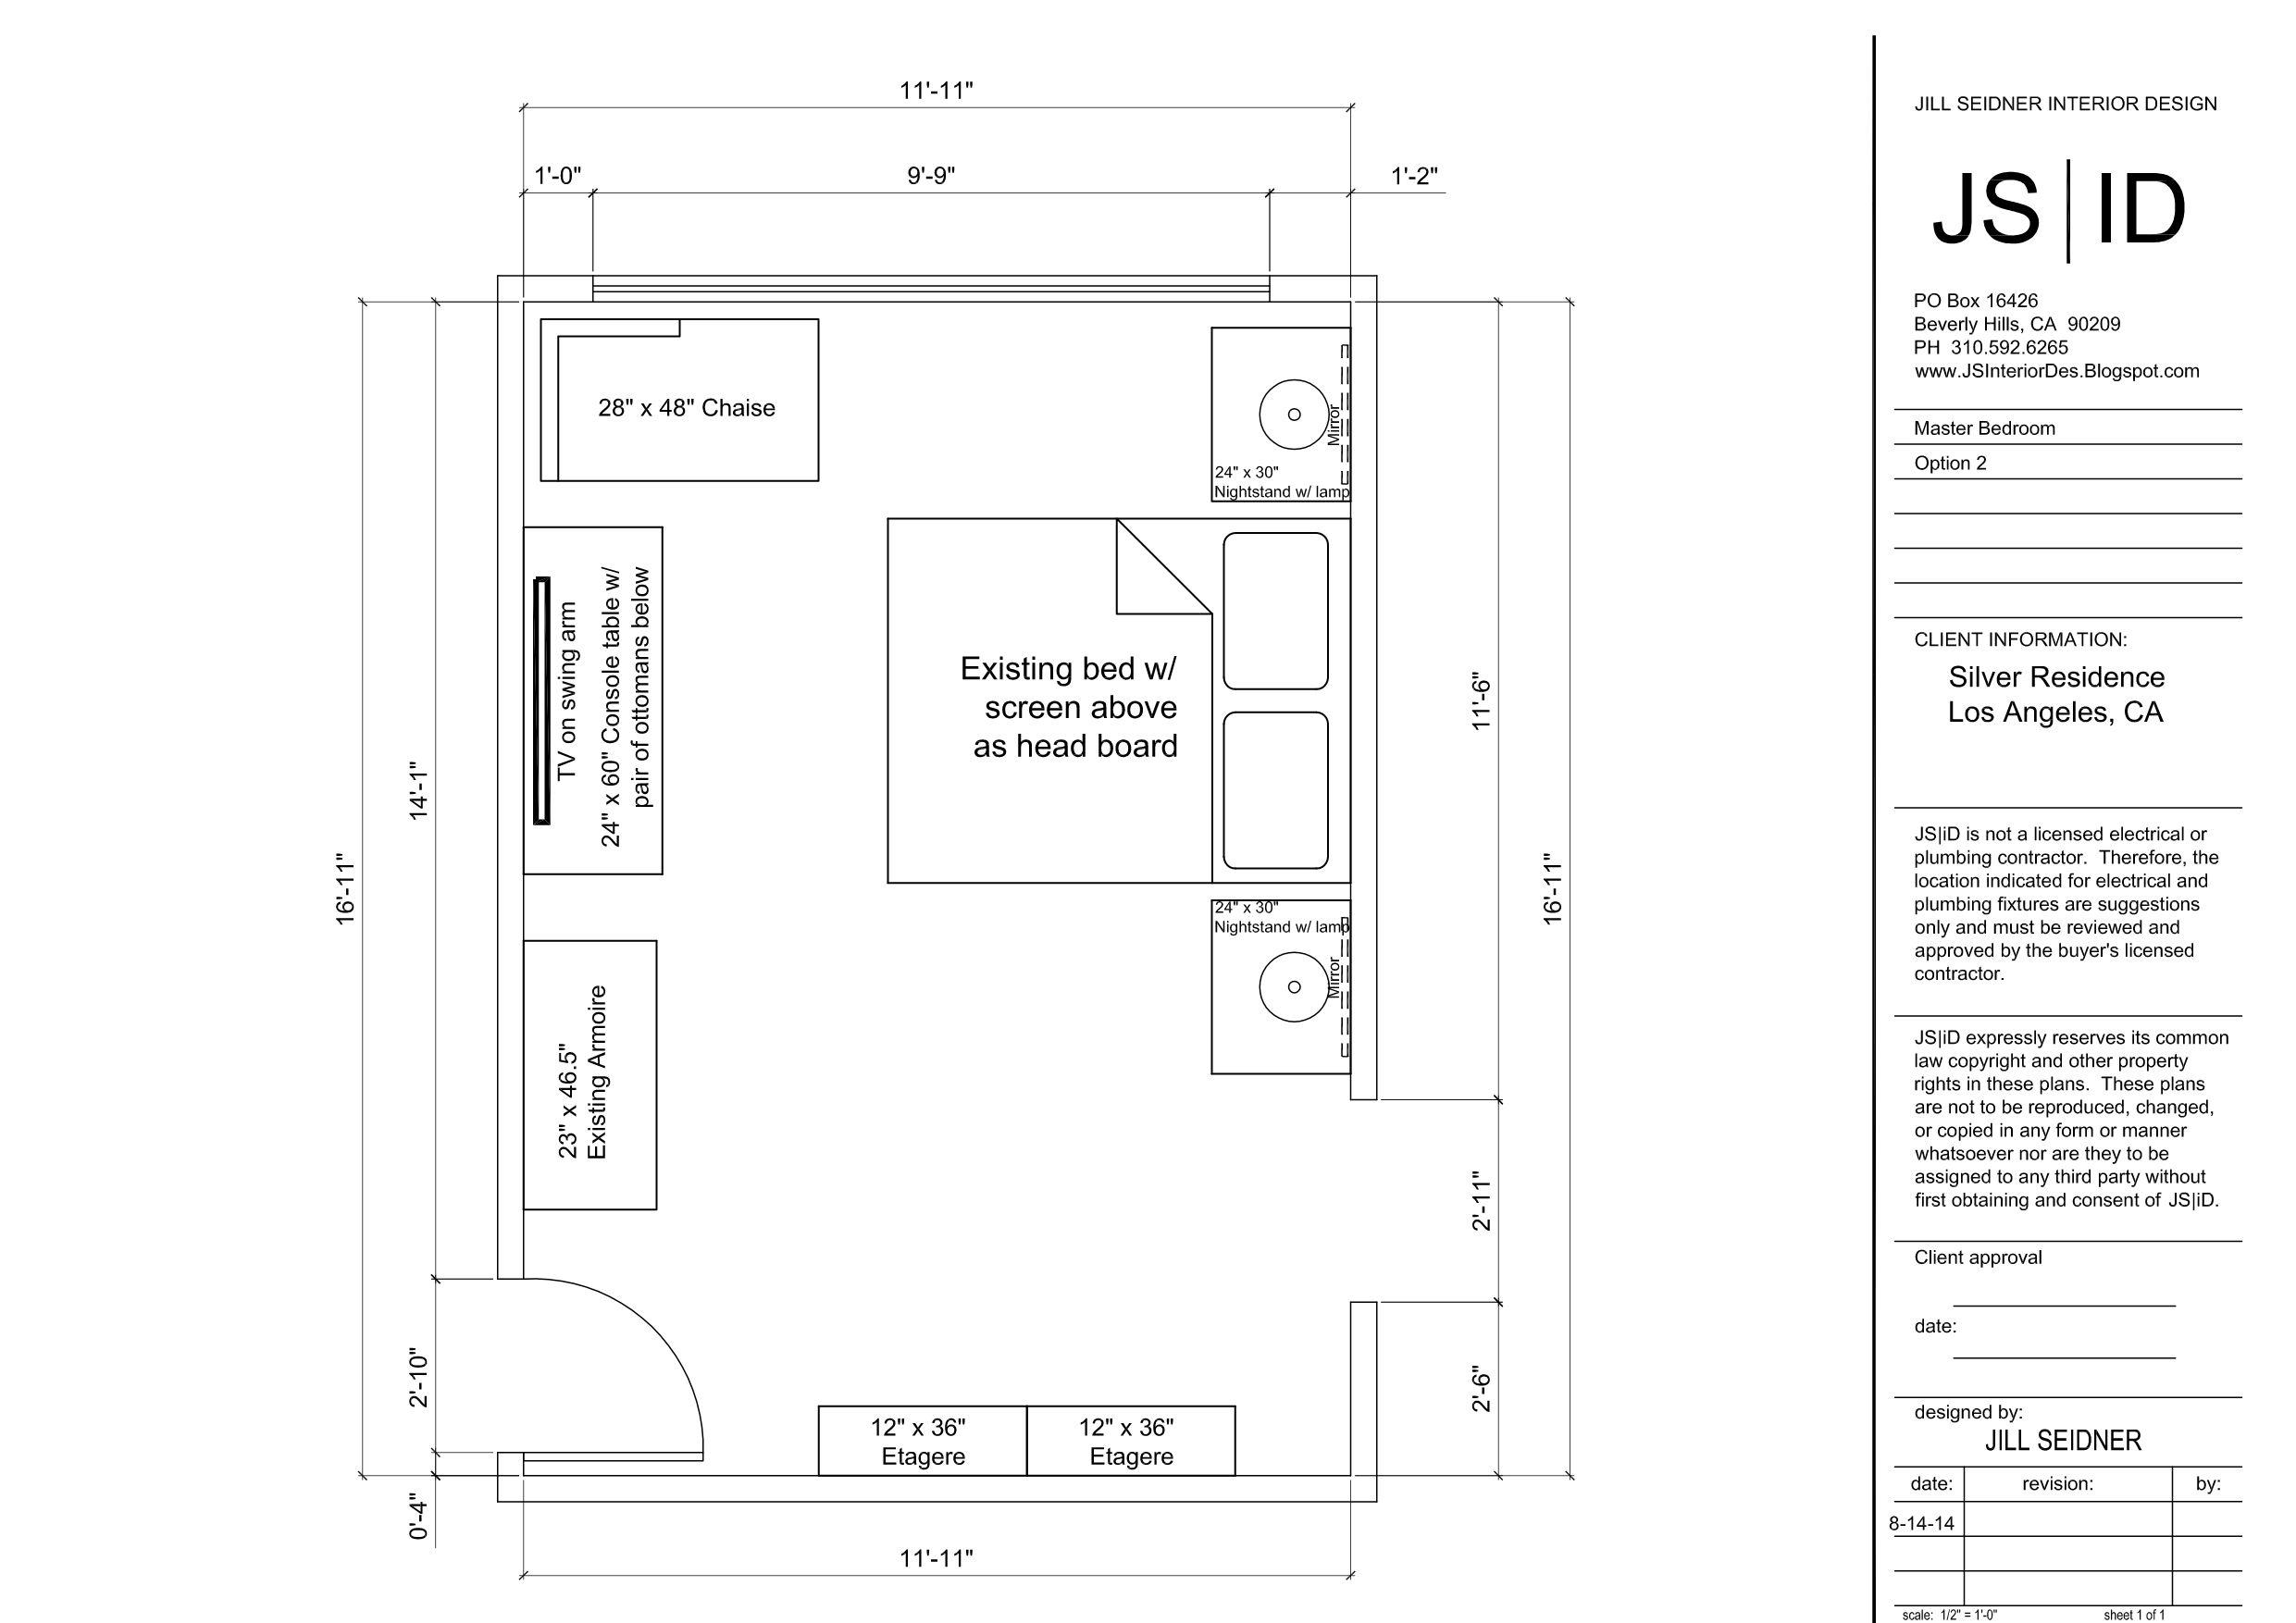 Burton Way Los Angeles Ca Condo Master Bedroom Furniture Floor Plan Layout Opt Master Bedroom Interior Design Bathroom Design Layout Bedroom Furniture Layout